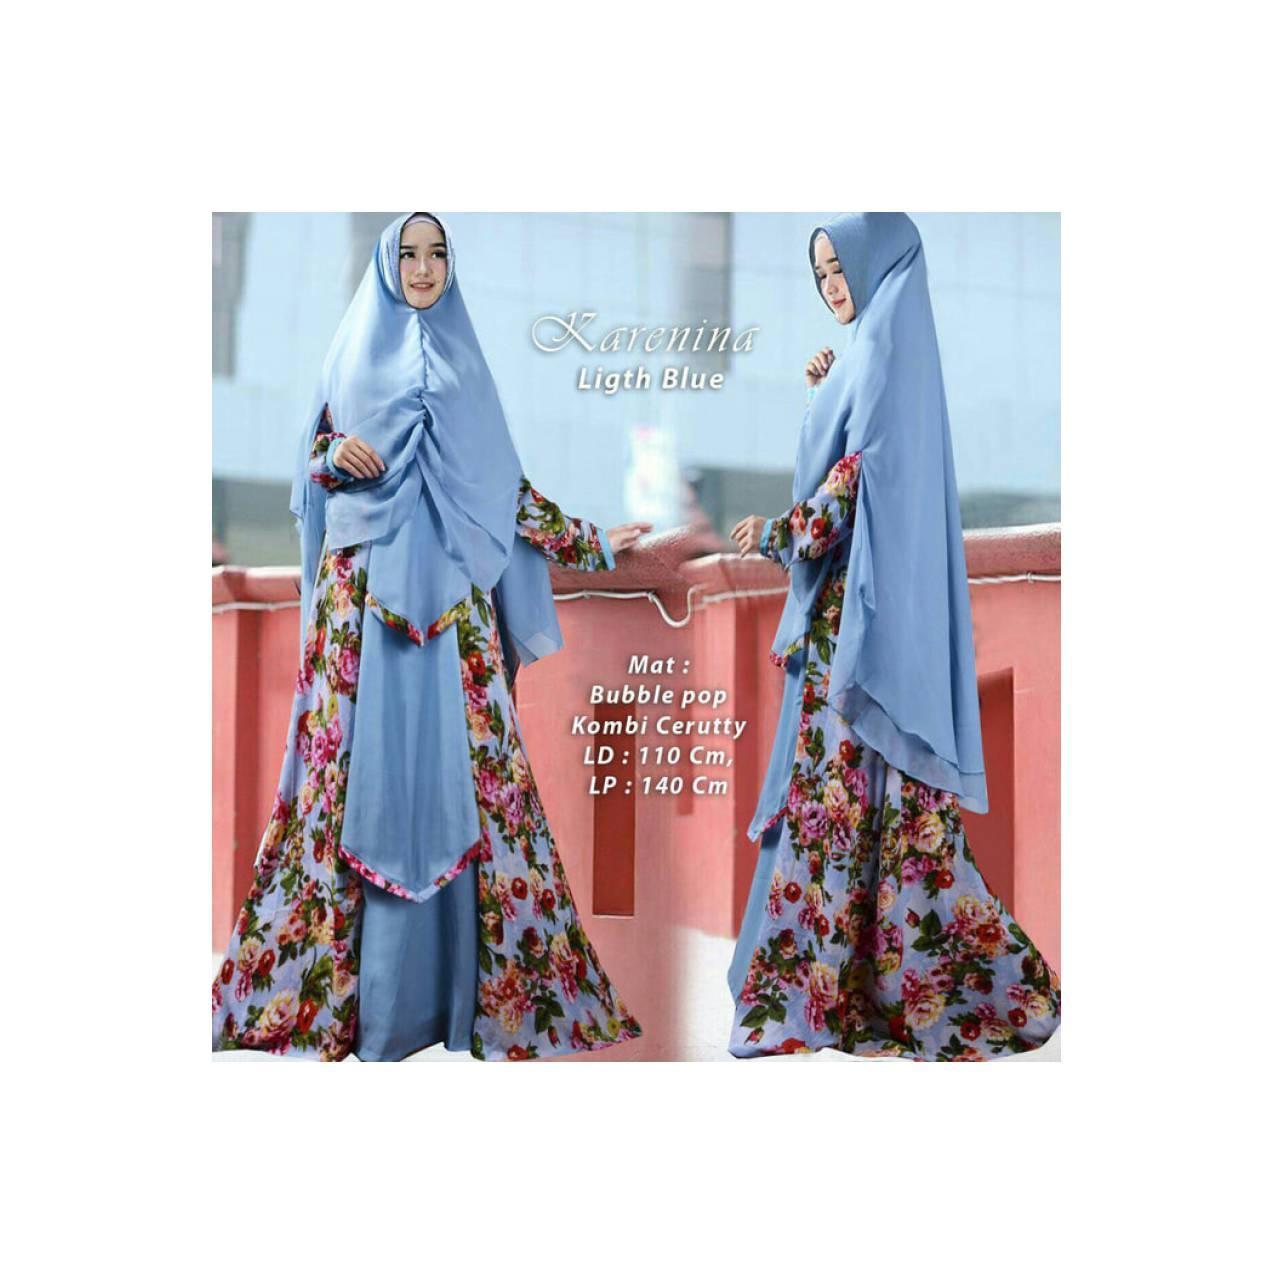 Baju Pengantin Muslimah 120273 GAMIS JUMBO SYARI KARENINA LIGHT BLUE